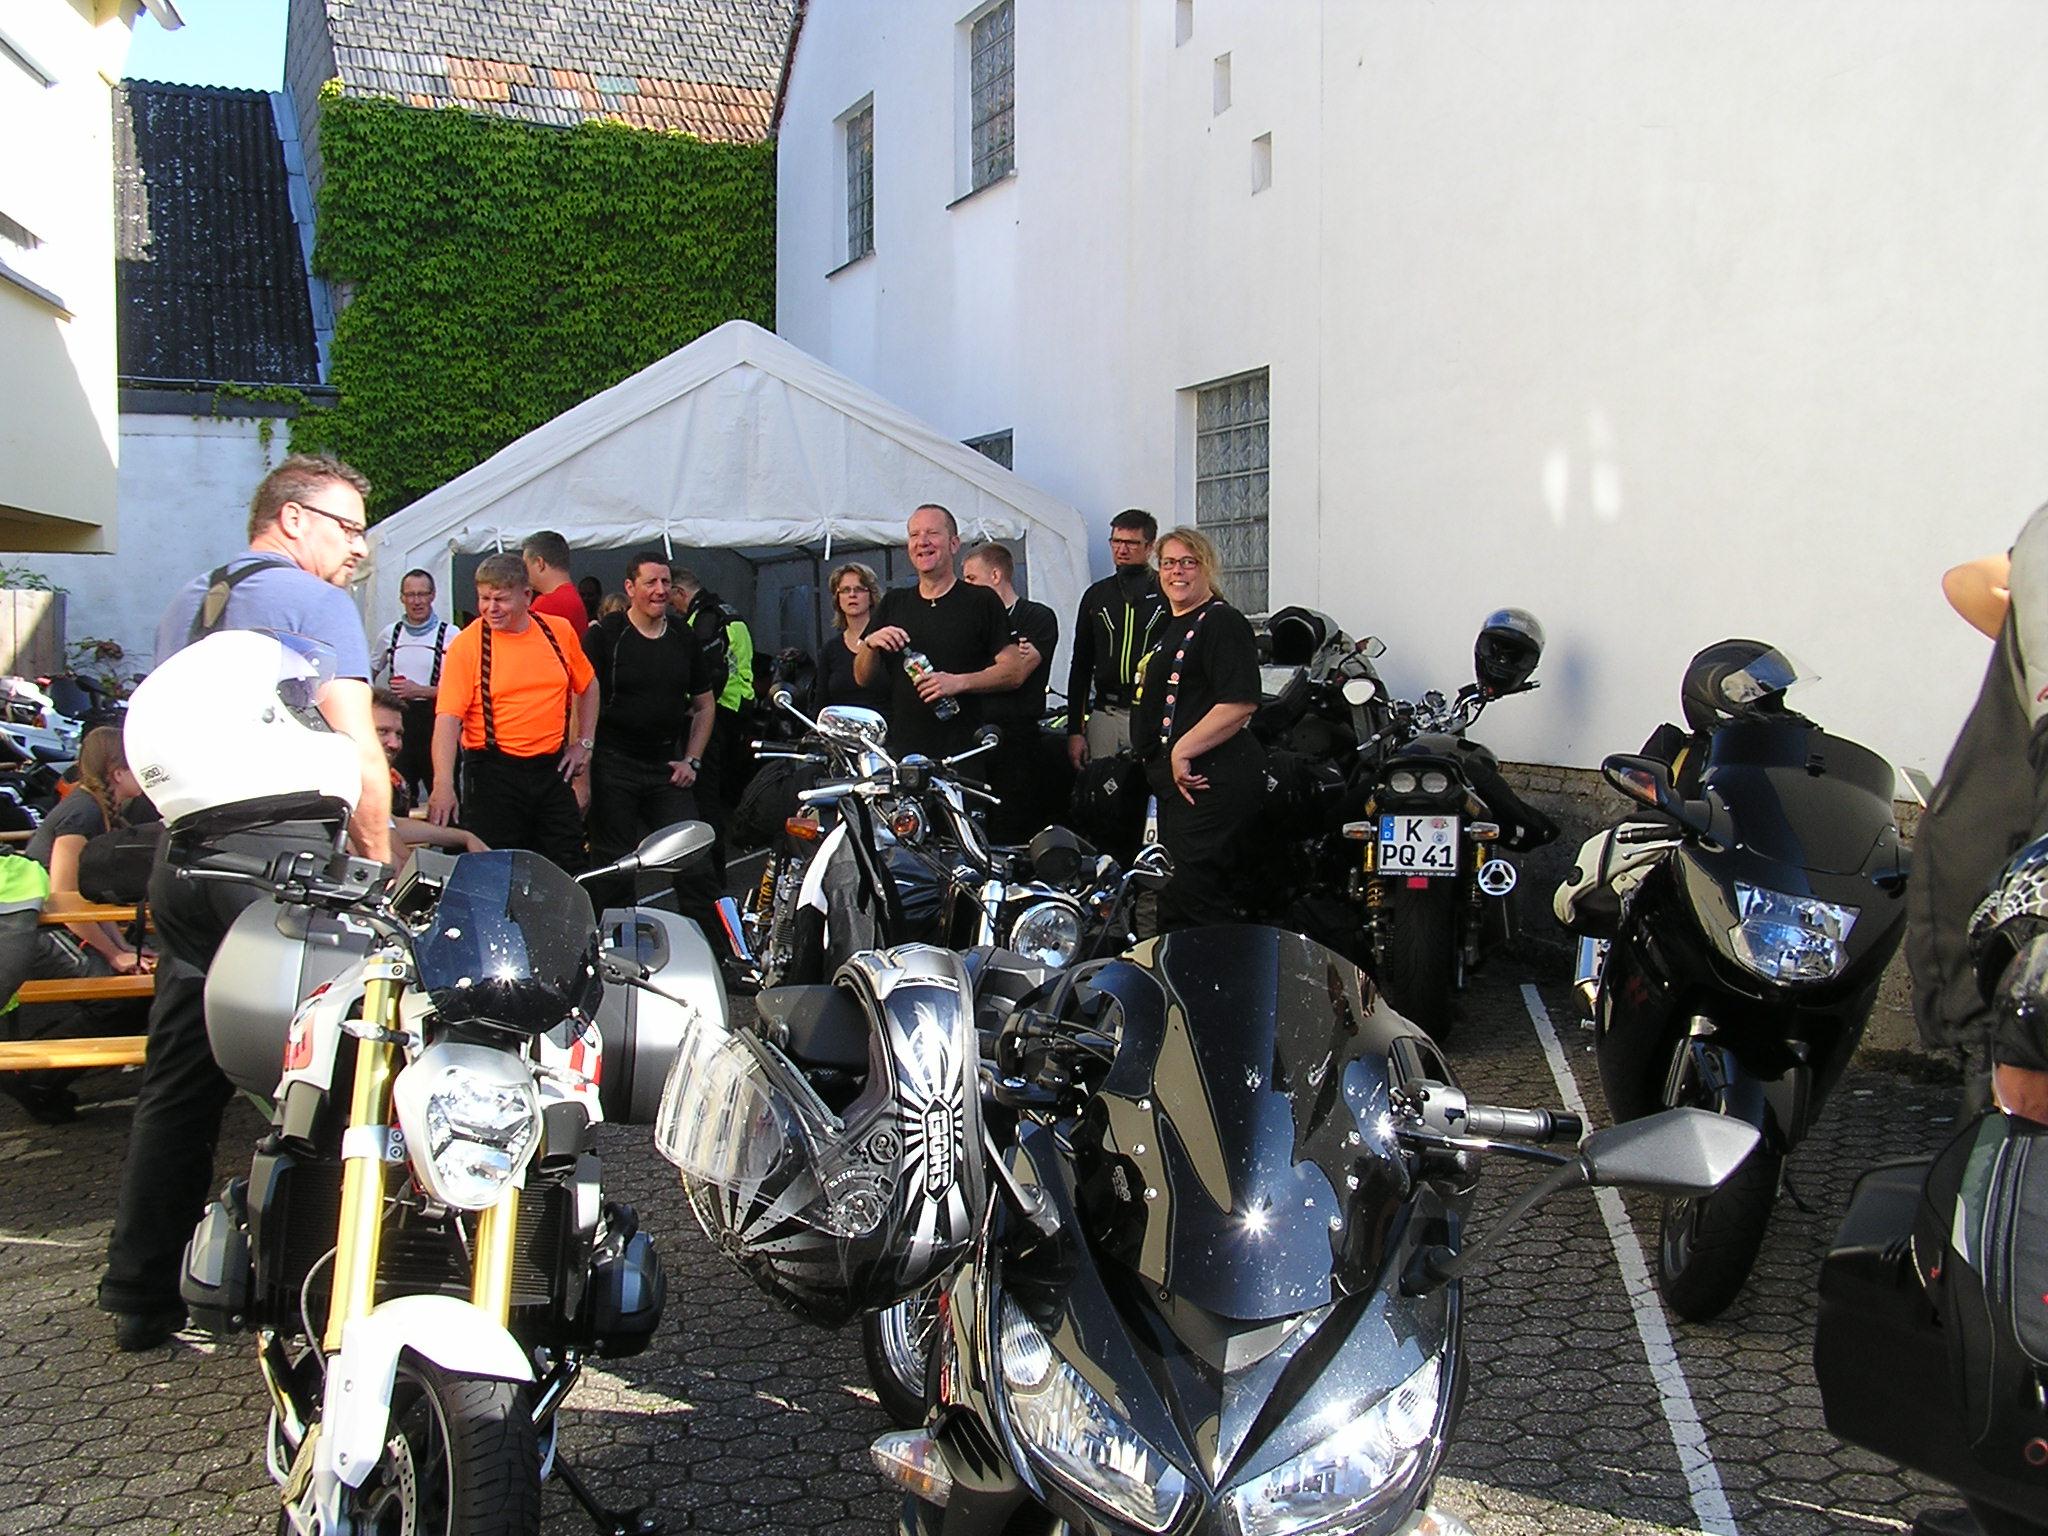 Westerwald_Tour_28_08_16 (6)